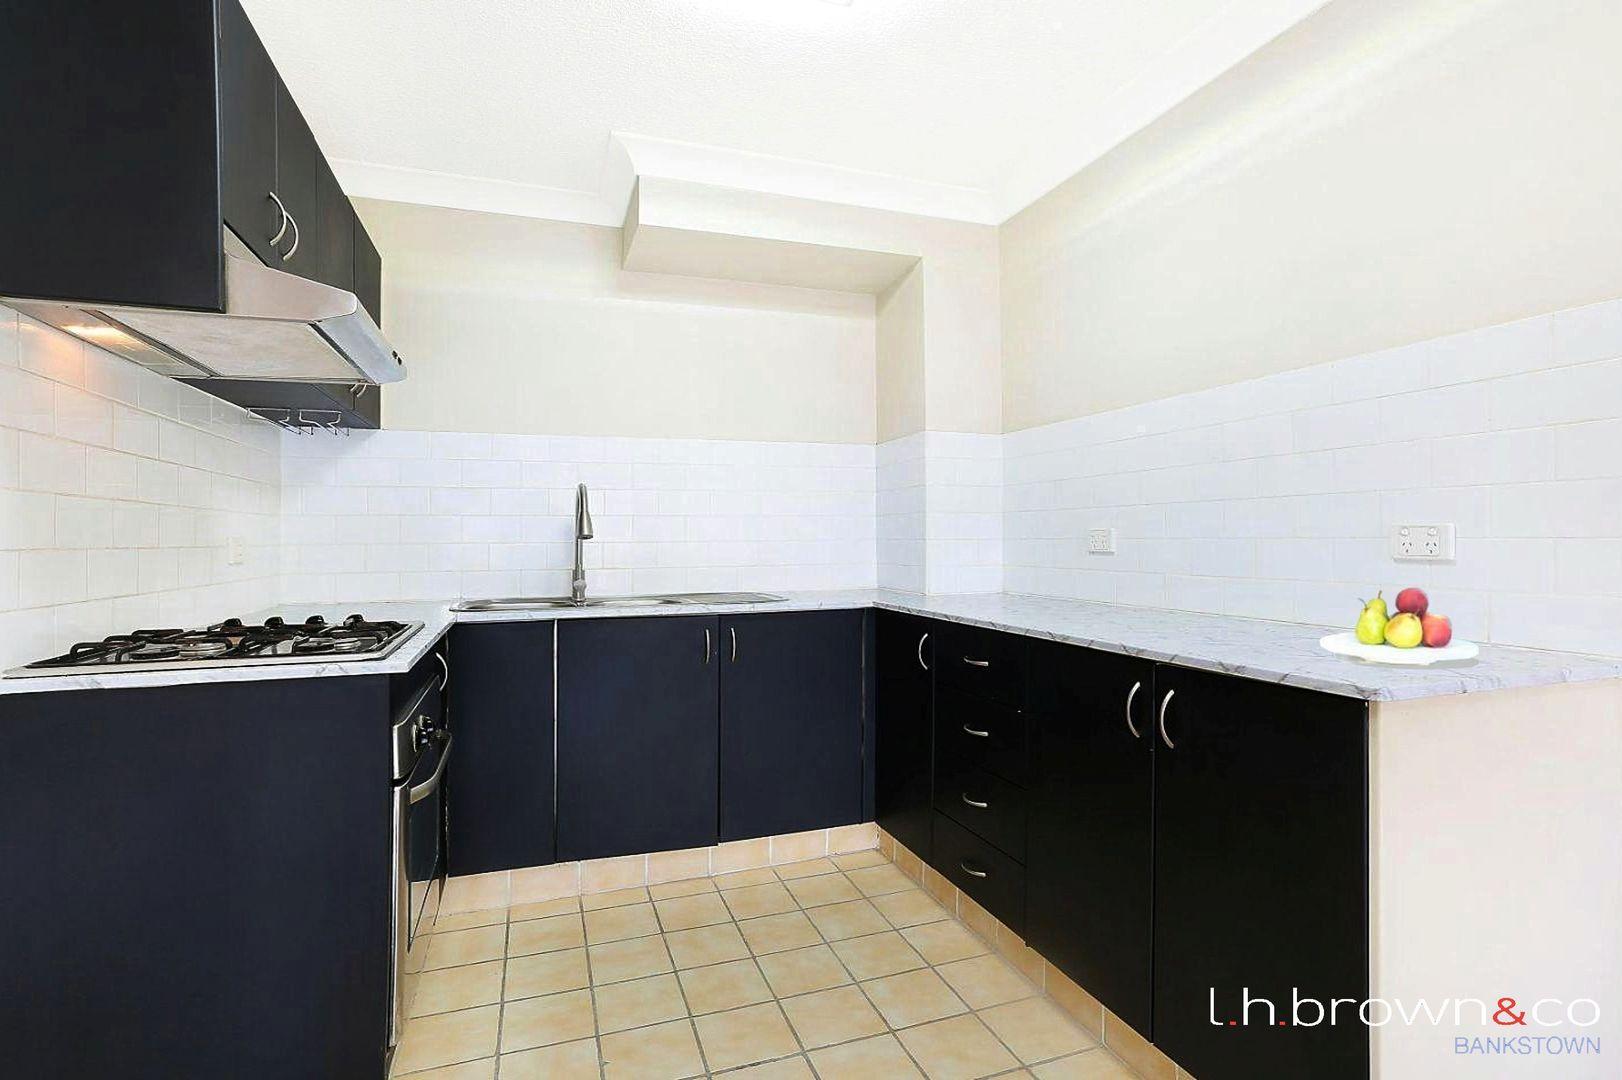 Unit 12/17-21 Stanley St, Bankstown NSW 2200, Image 2